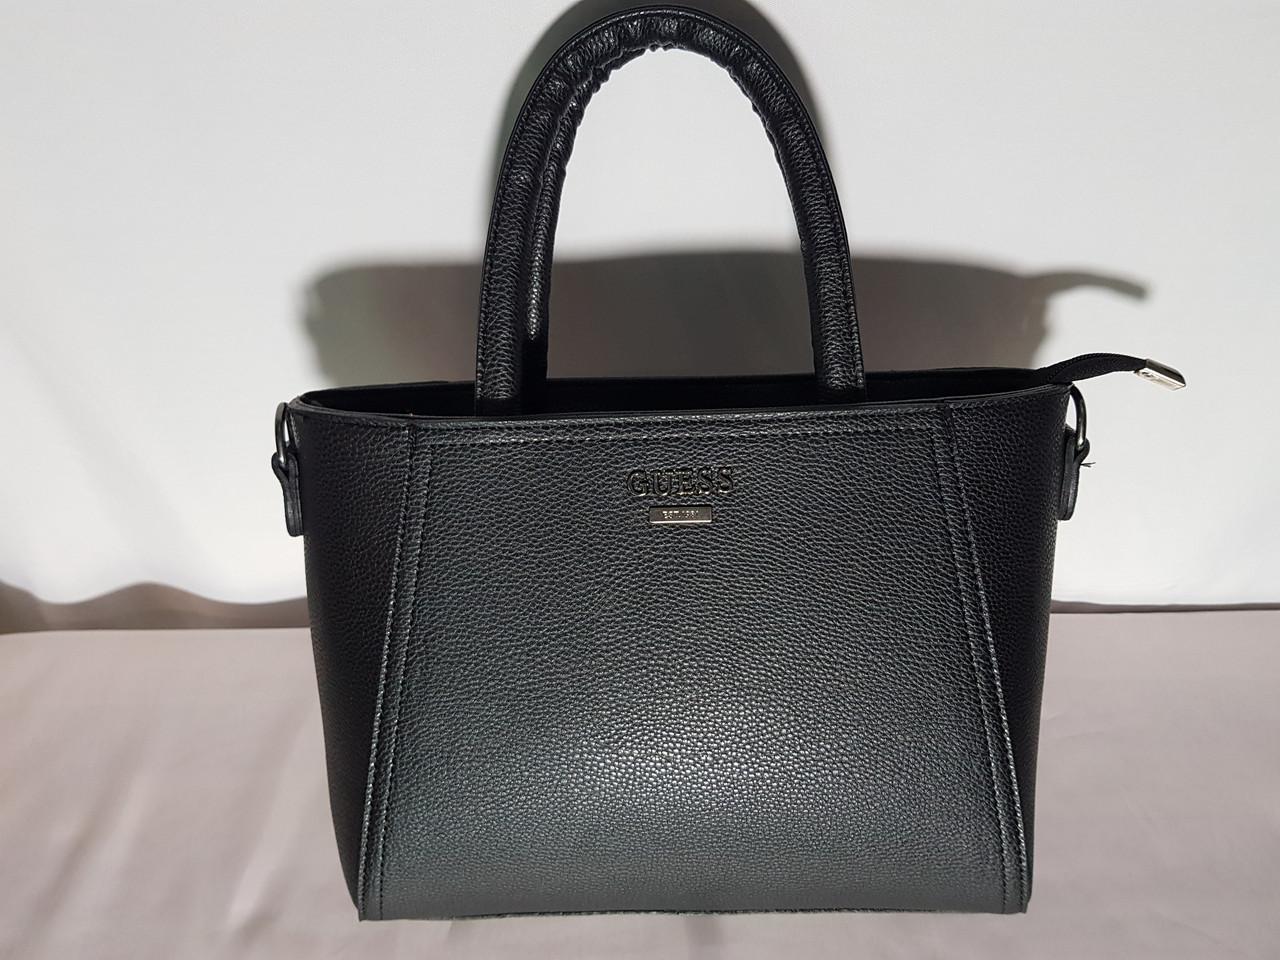 cb6c87403903 Женская сумка Guess, цена 750 грн., купить в Черкассах — Prom.ua (ID ...